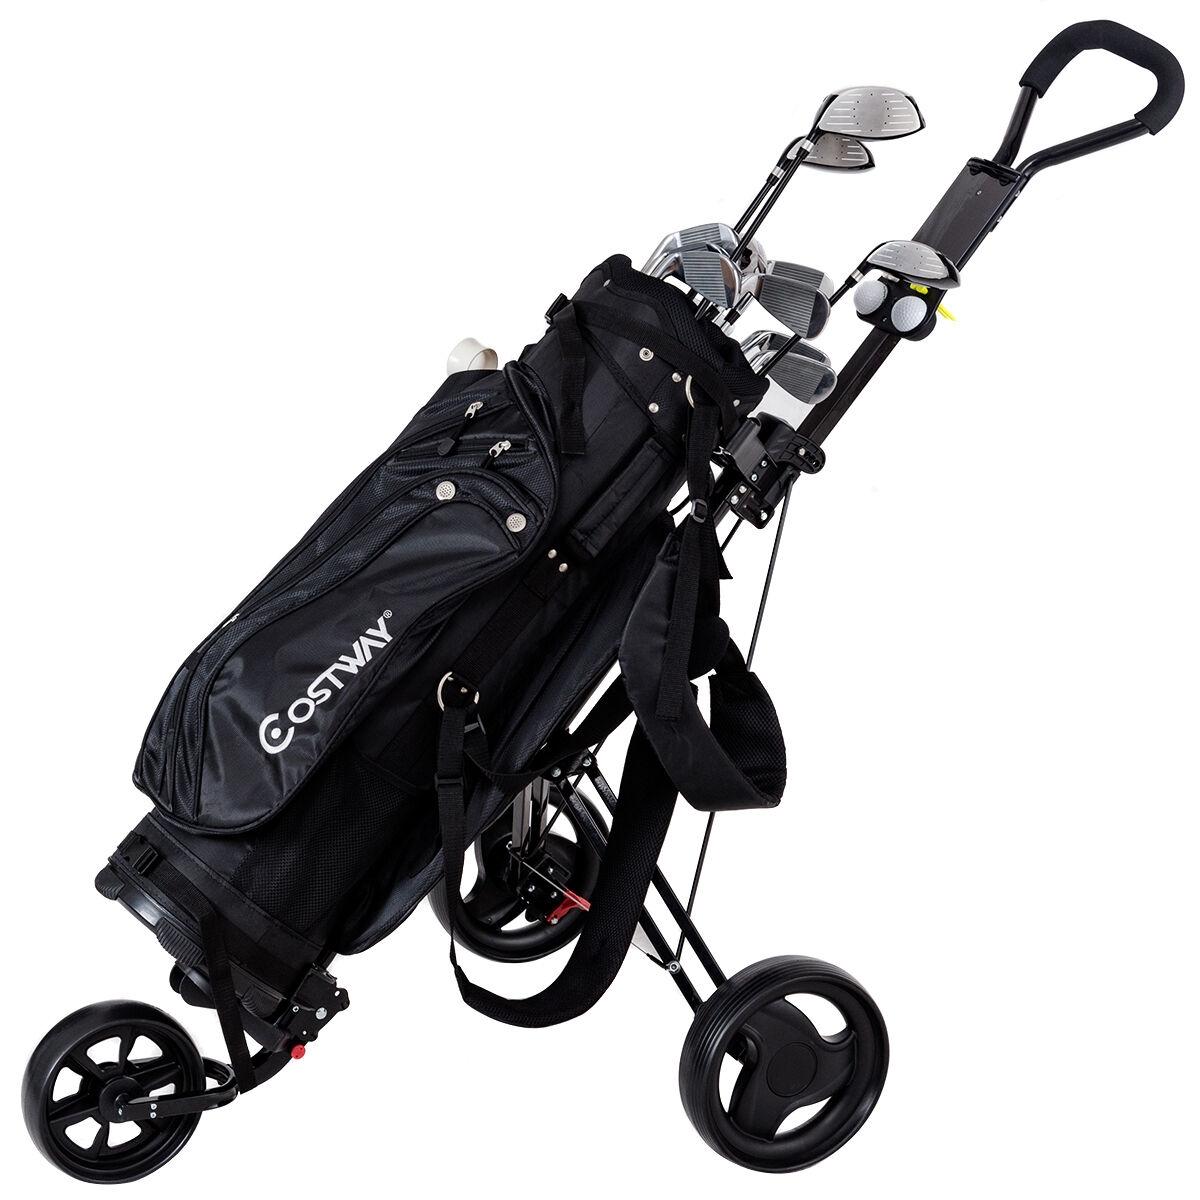 Lightweight Foldable Steel Golf Cart with Adjustable Bag Strap